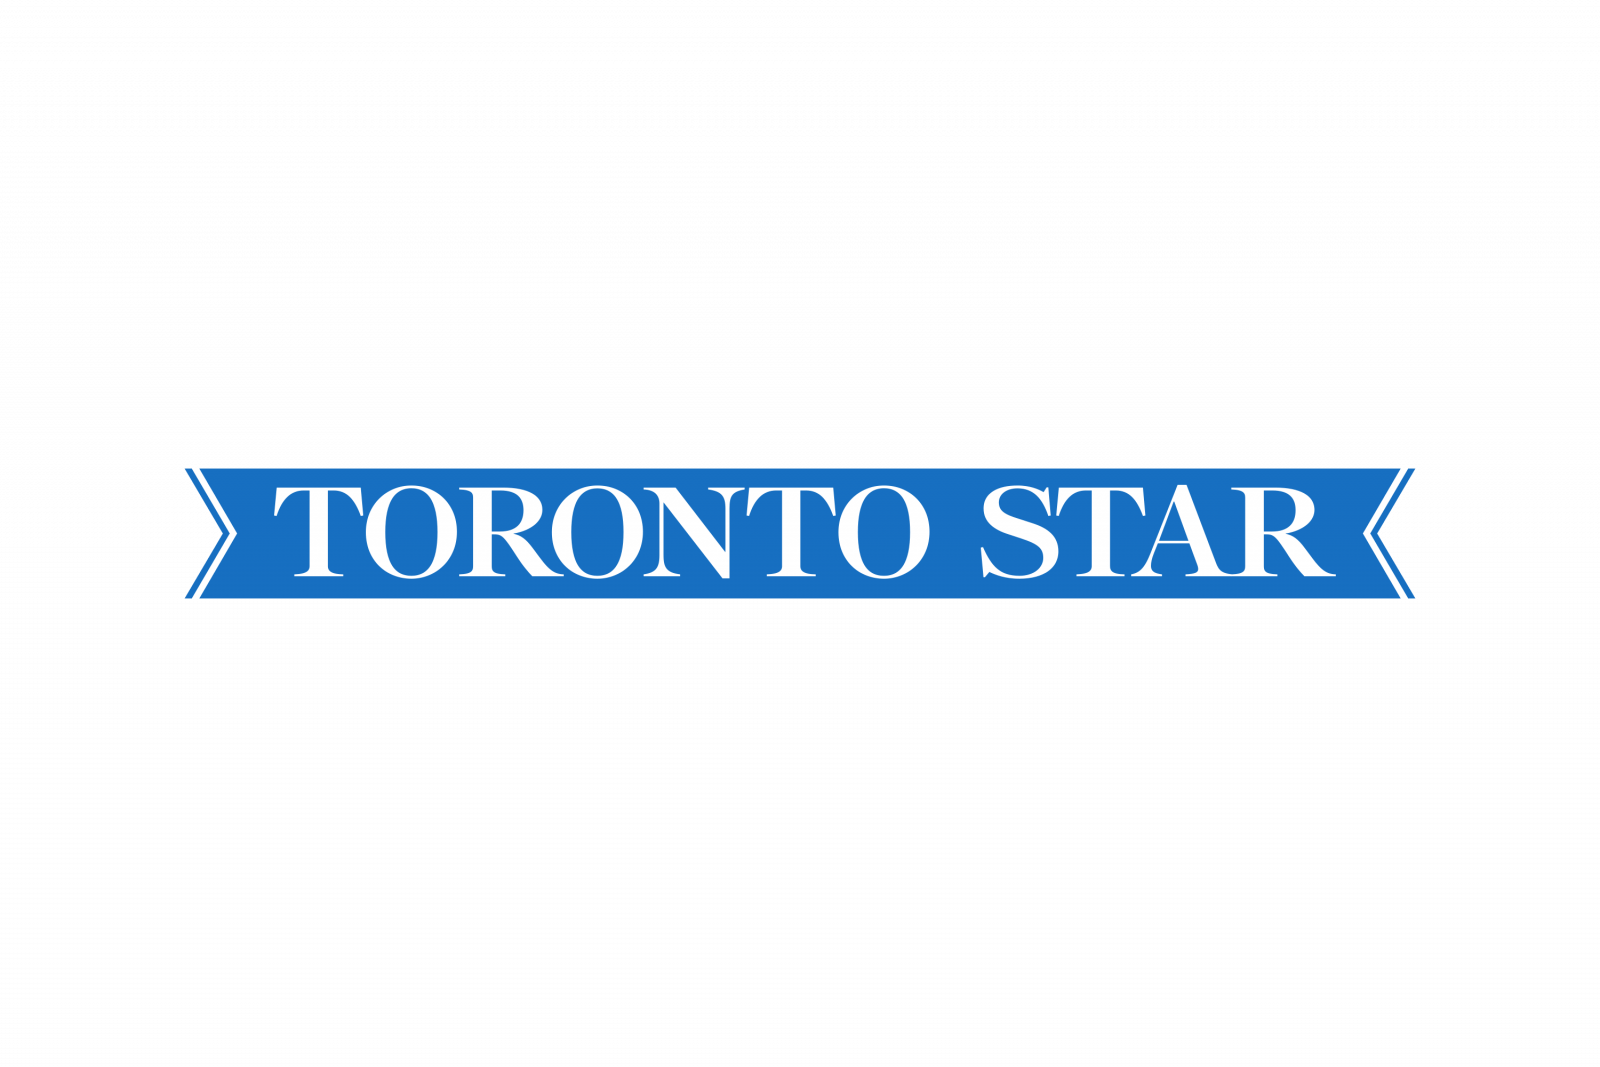 Toronto Star - Bee Video